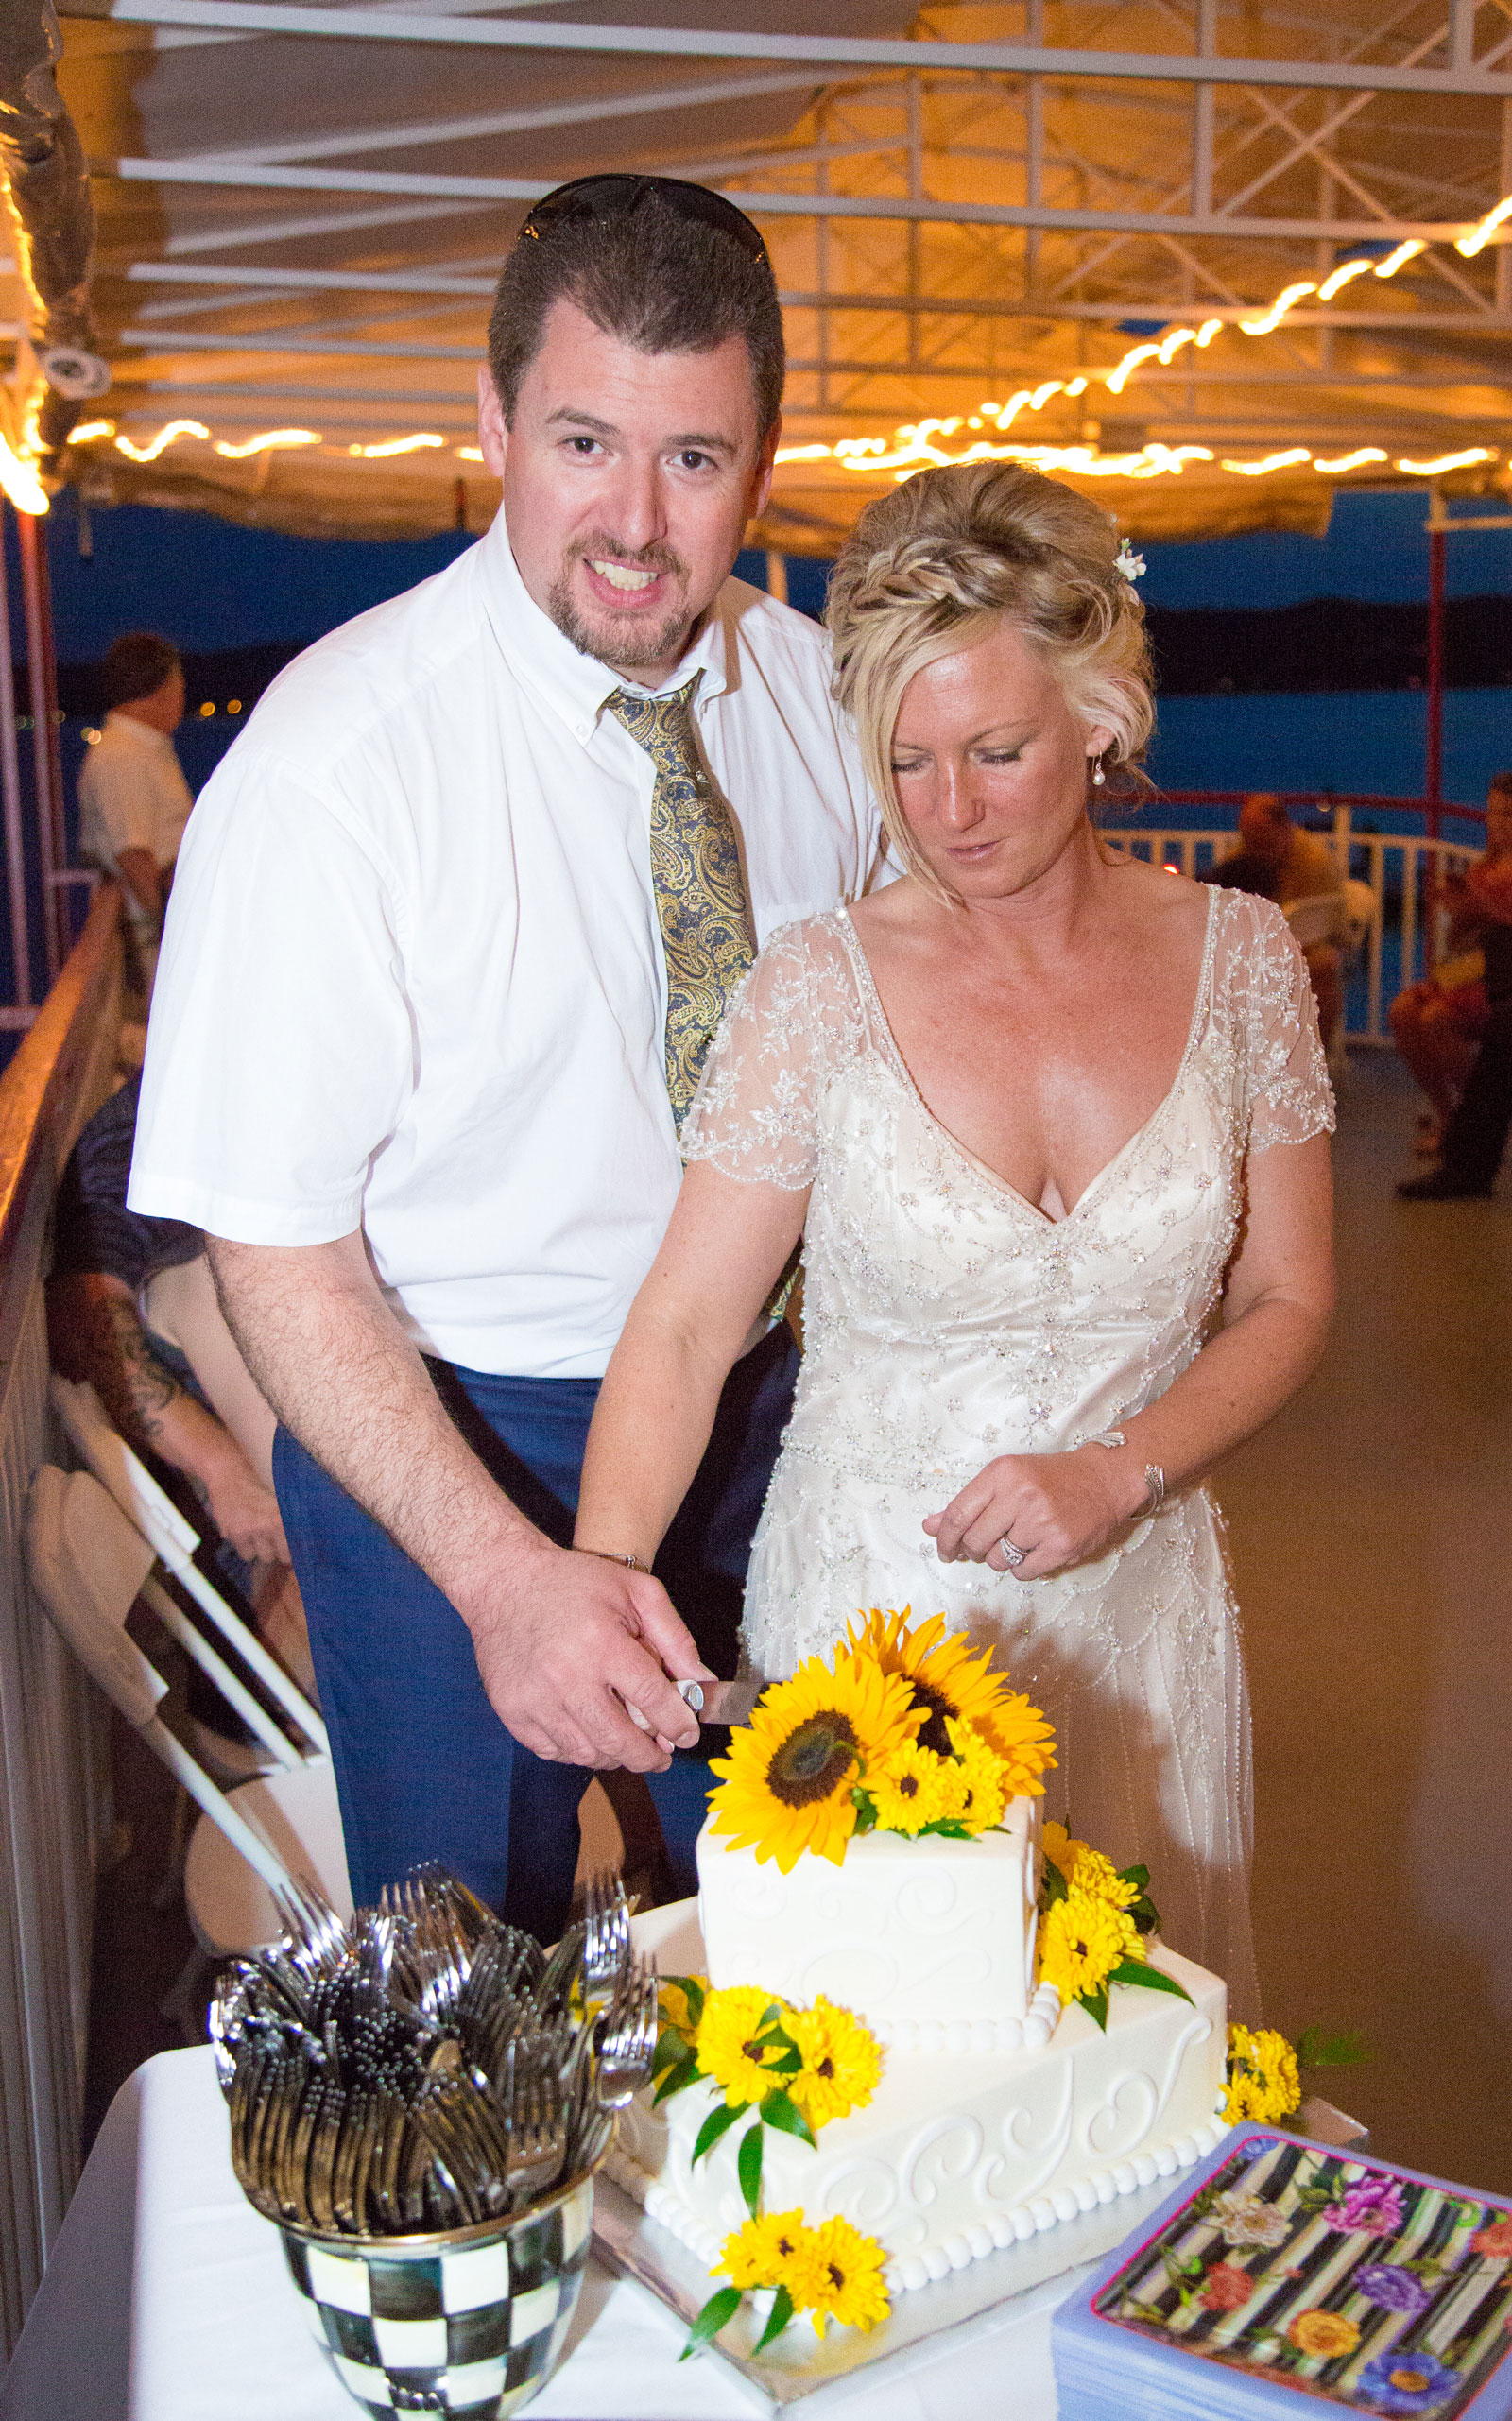 Canandaigua, NY Wedding Ceremony bride groom cut wedding cake